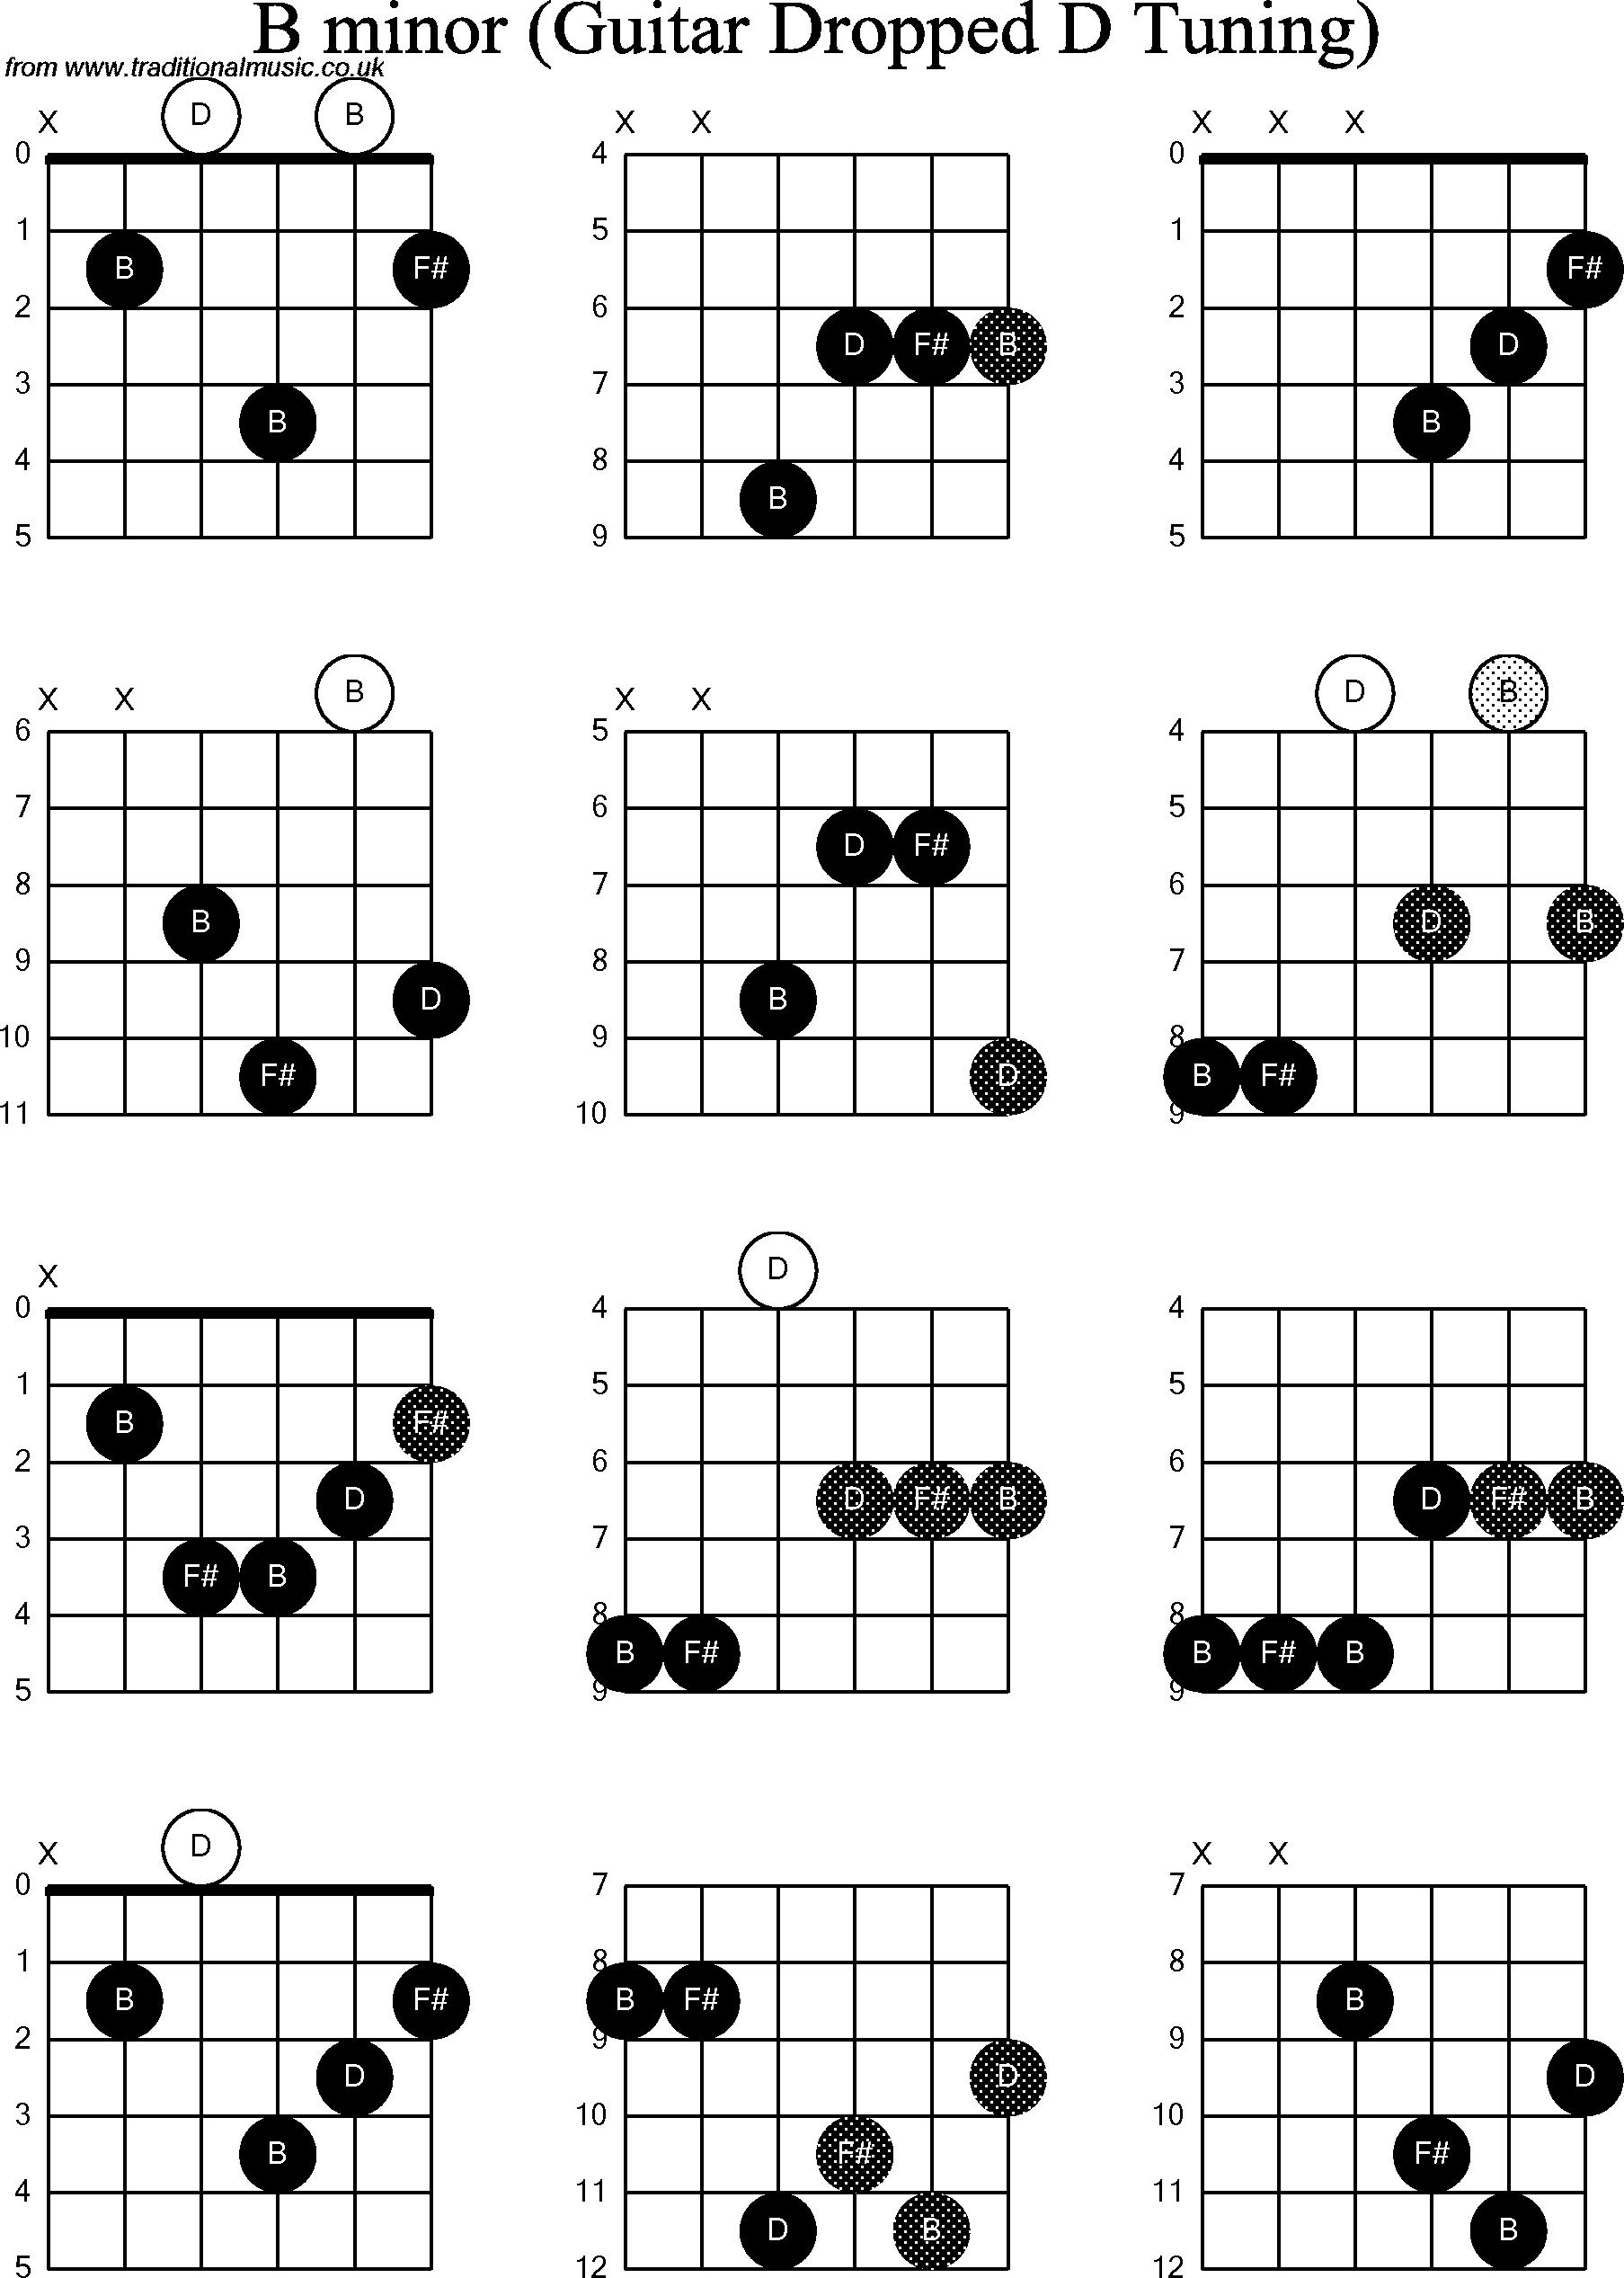 B Guitar Chord Chord Diagrams For Dropped D Guitardadgbe B Minor